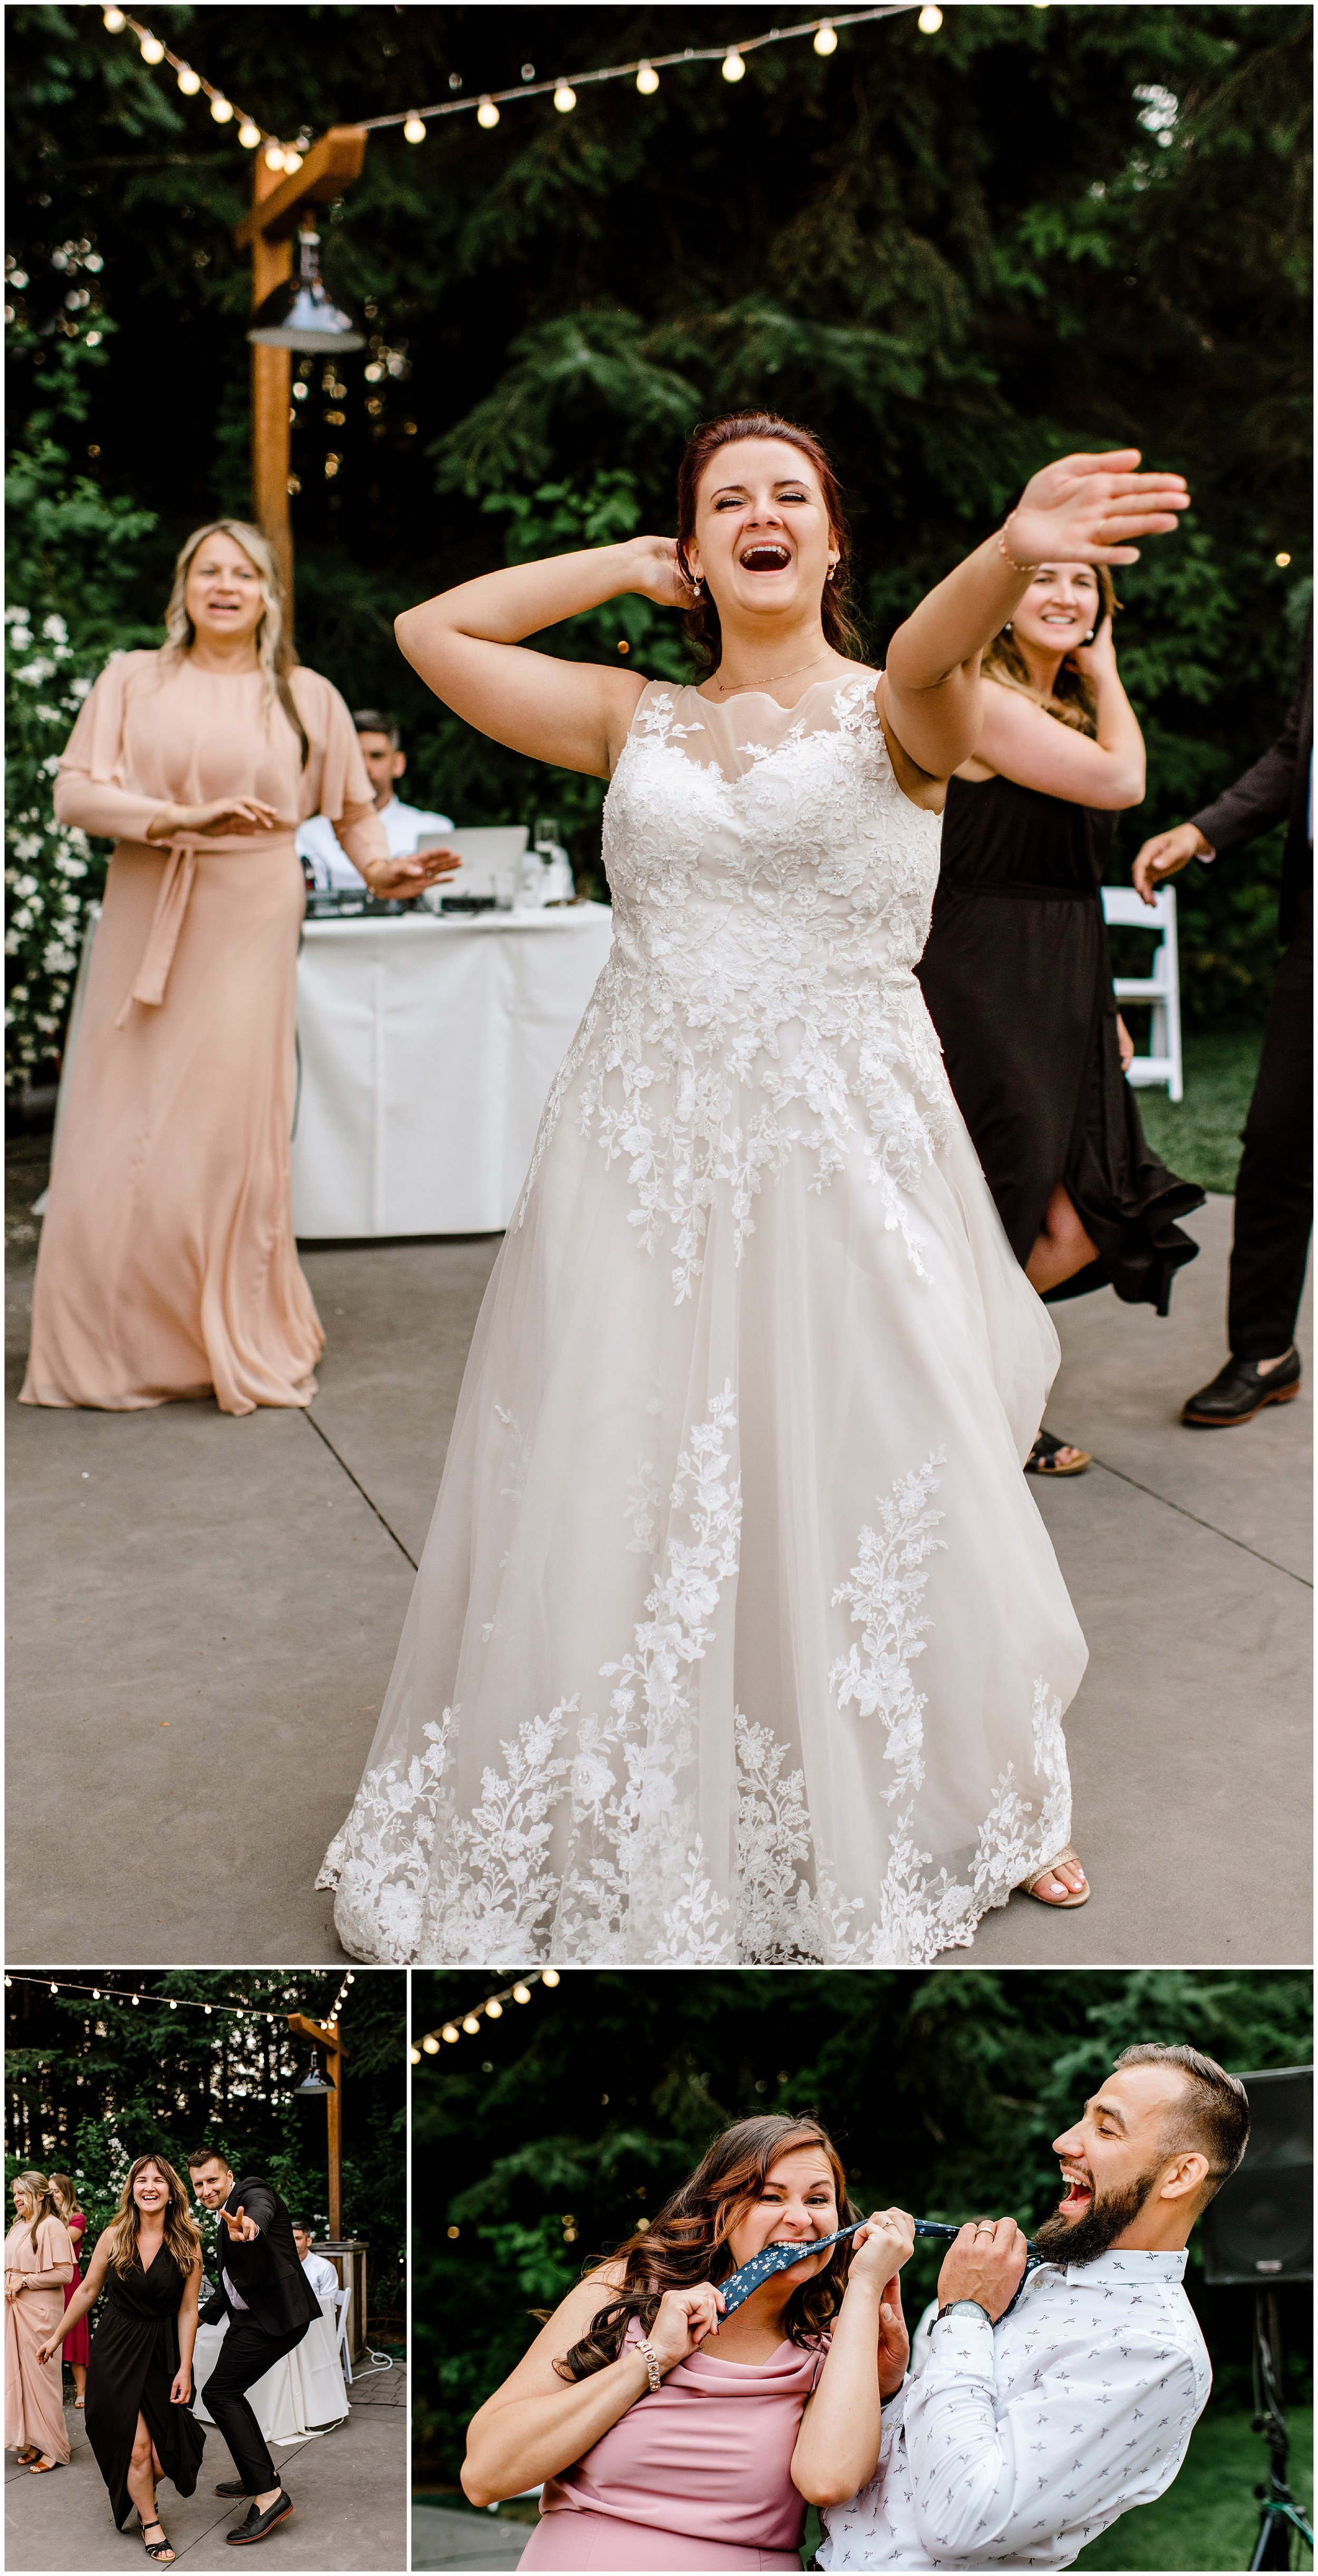 Citrus-inspired-wedding-at-Gorge-Crest-Vineyard-200.jpg